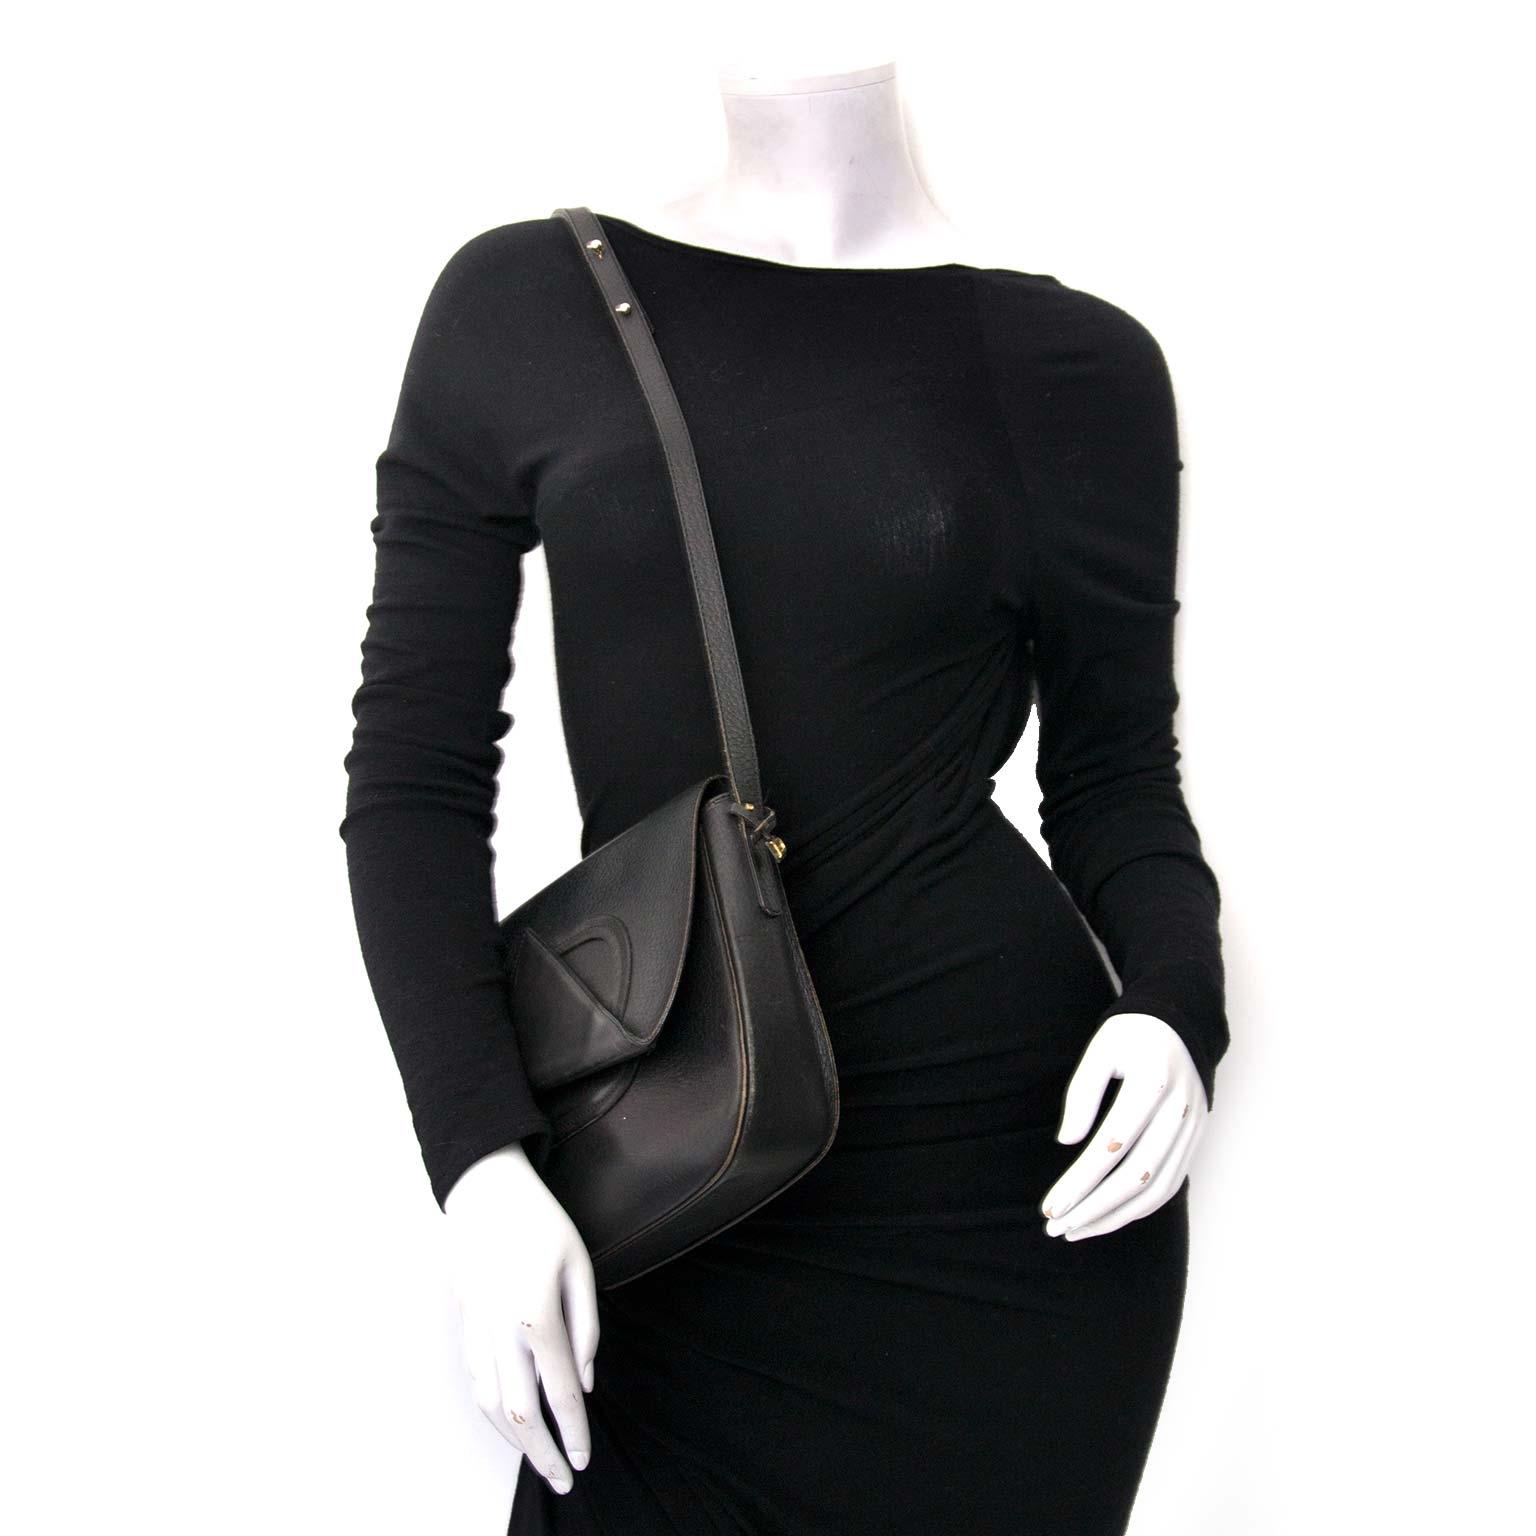 Delvaux Black Textured Leather Saddle Flap Bag Buy authentic designer Delvaux secondhand bags at Labellov at the best price. Safe and secure shopping. Koop tweedehands authentieke Delvaux tassen bij designer webwinkel labellov.